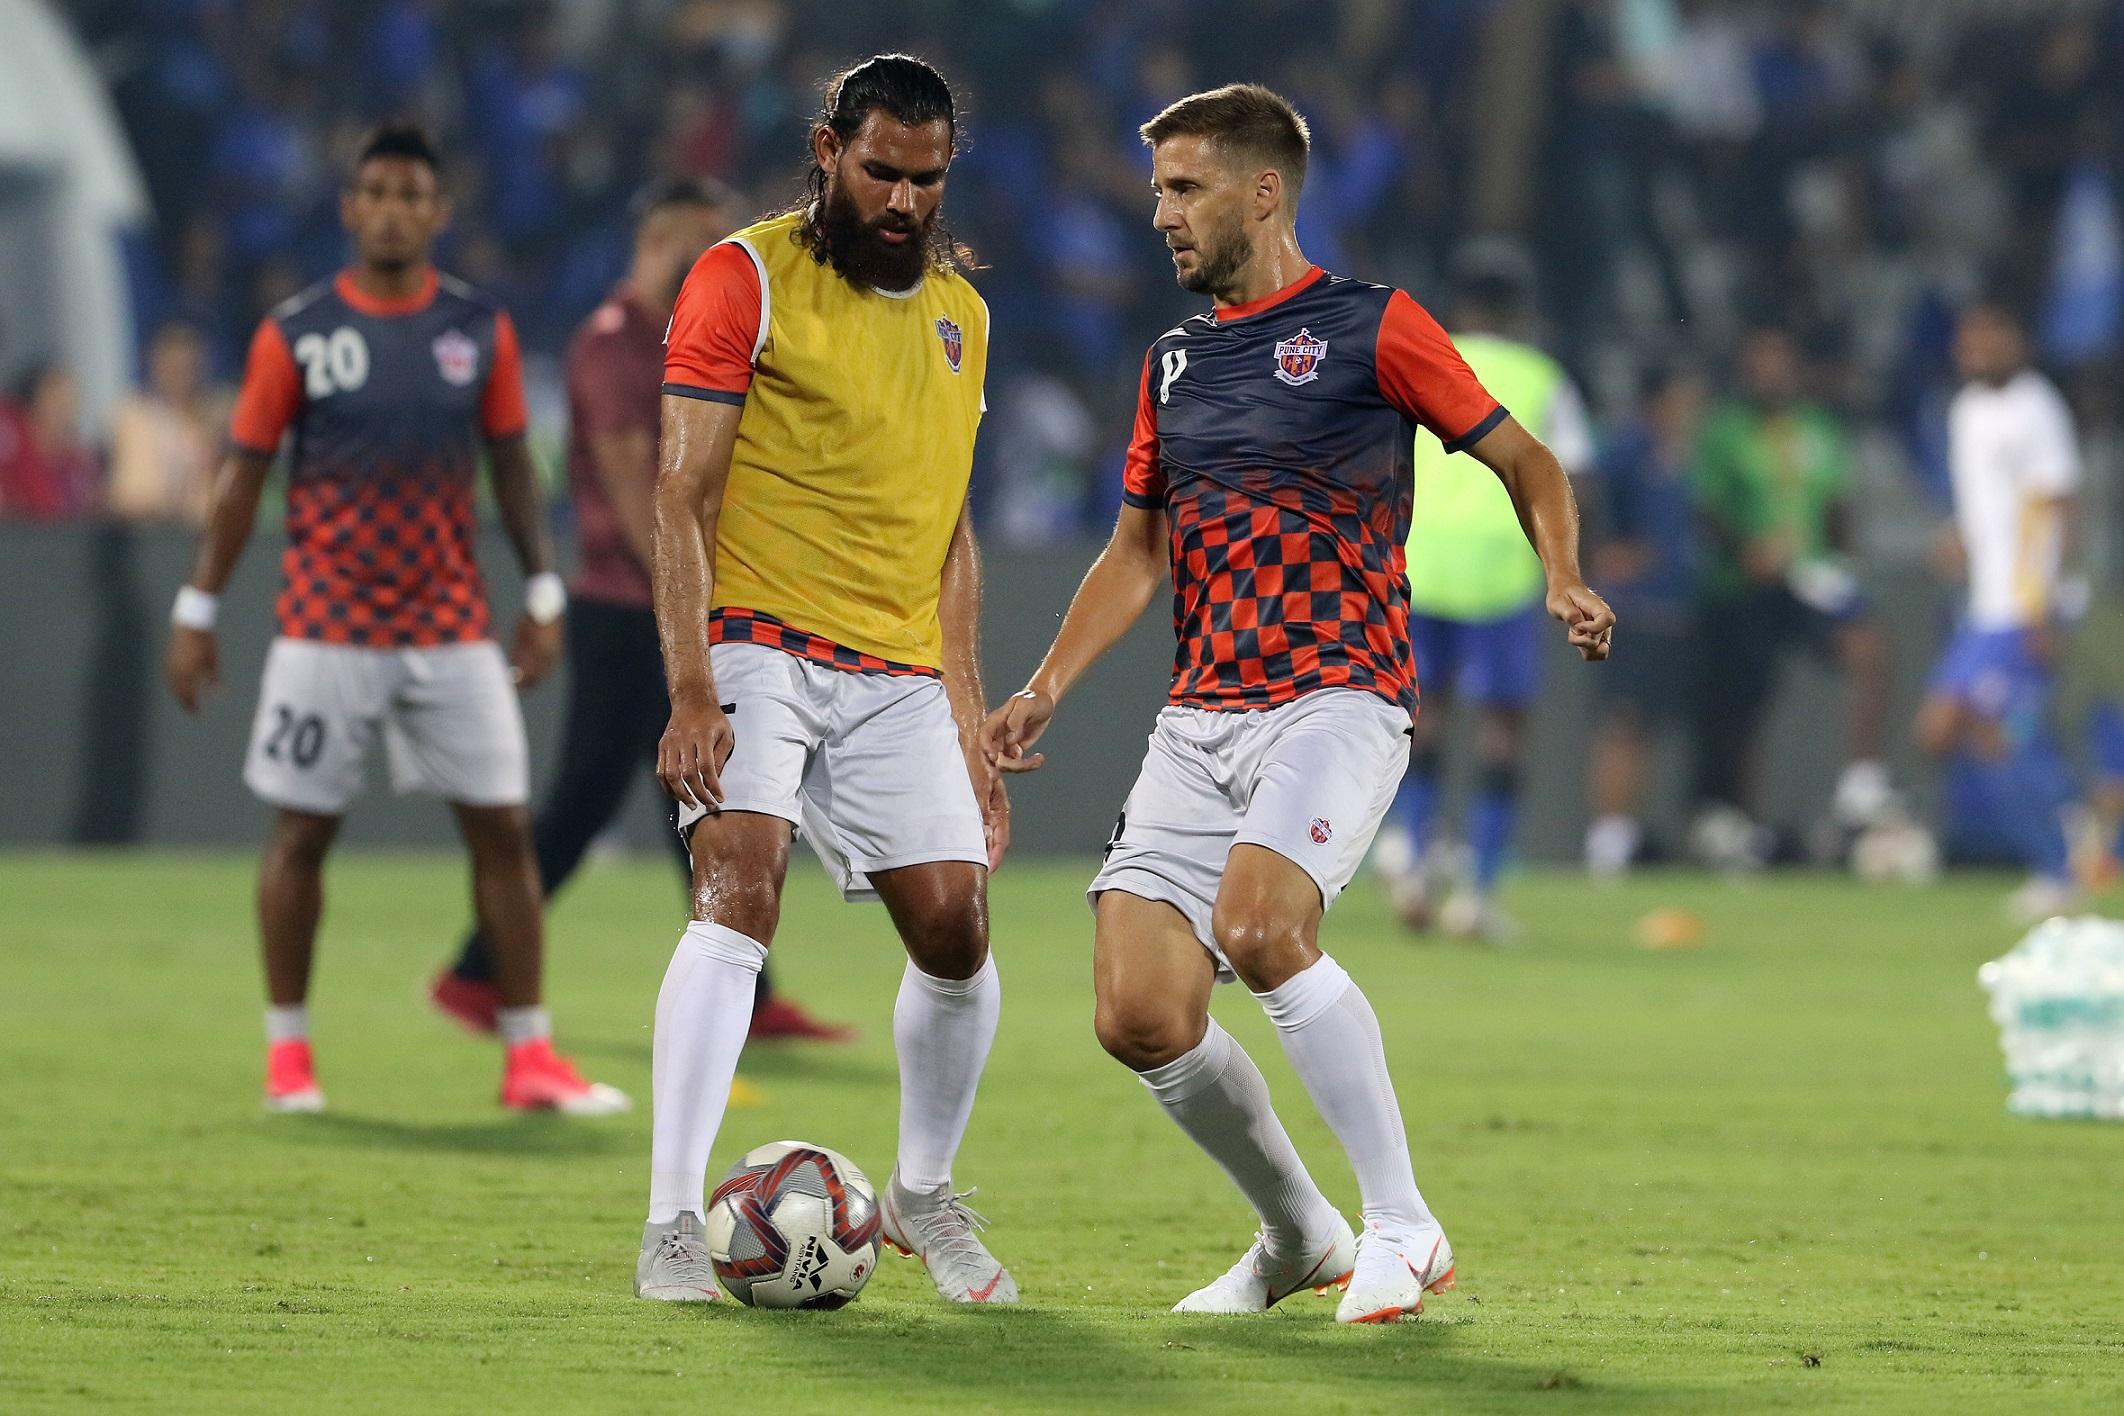 Isl 2018 Fc Pune City Vs Bengaluru Fc Preview